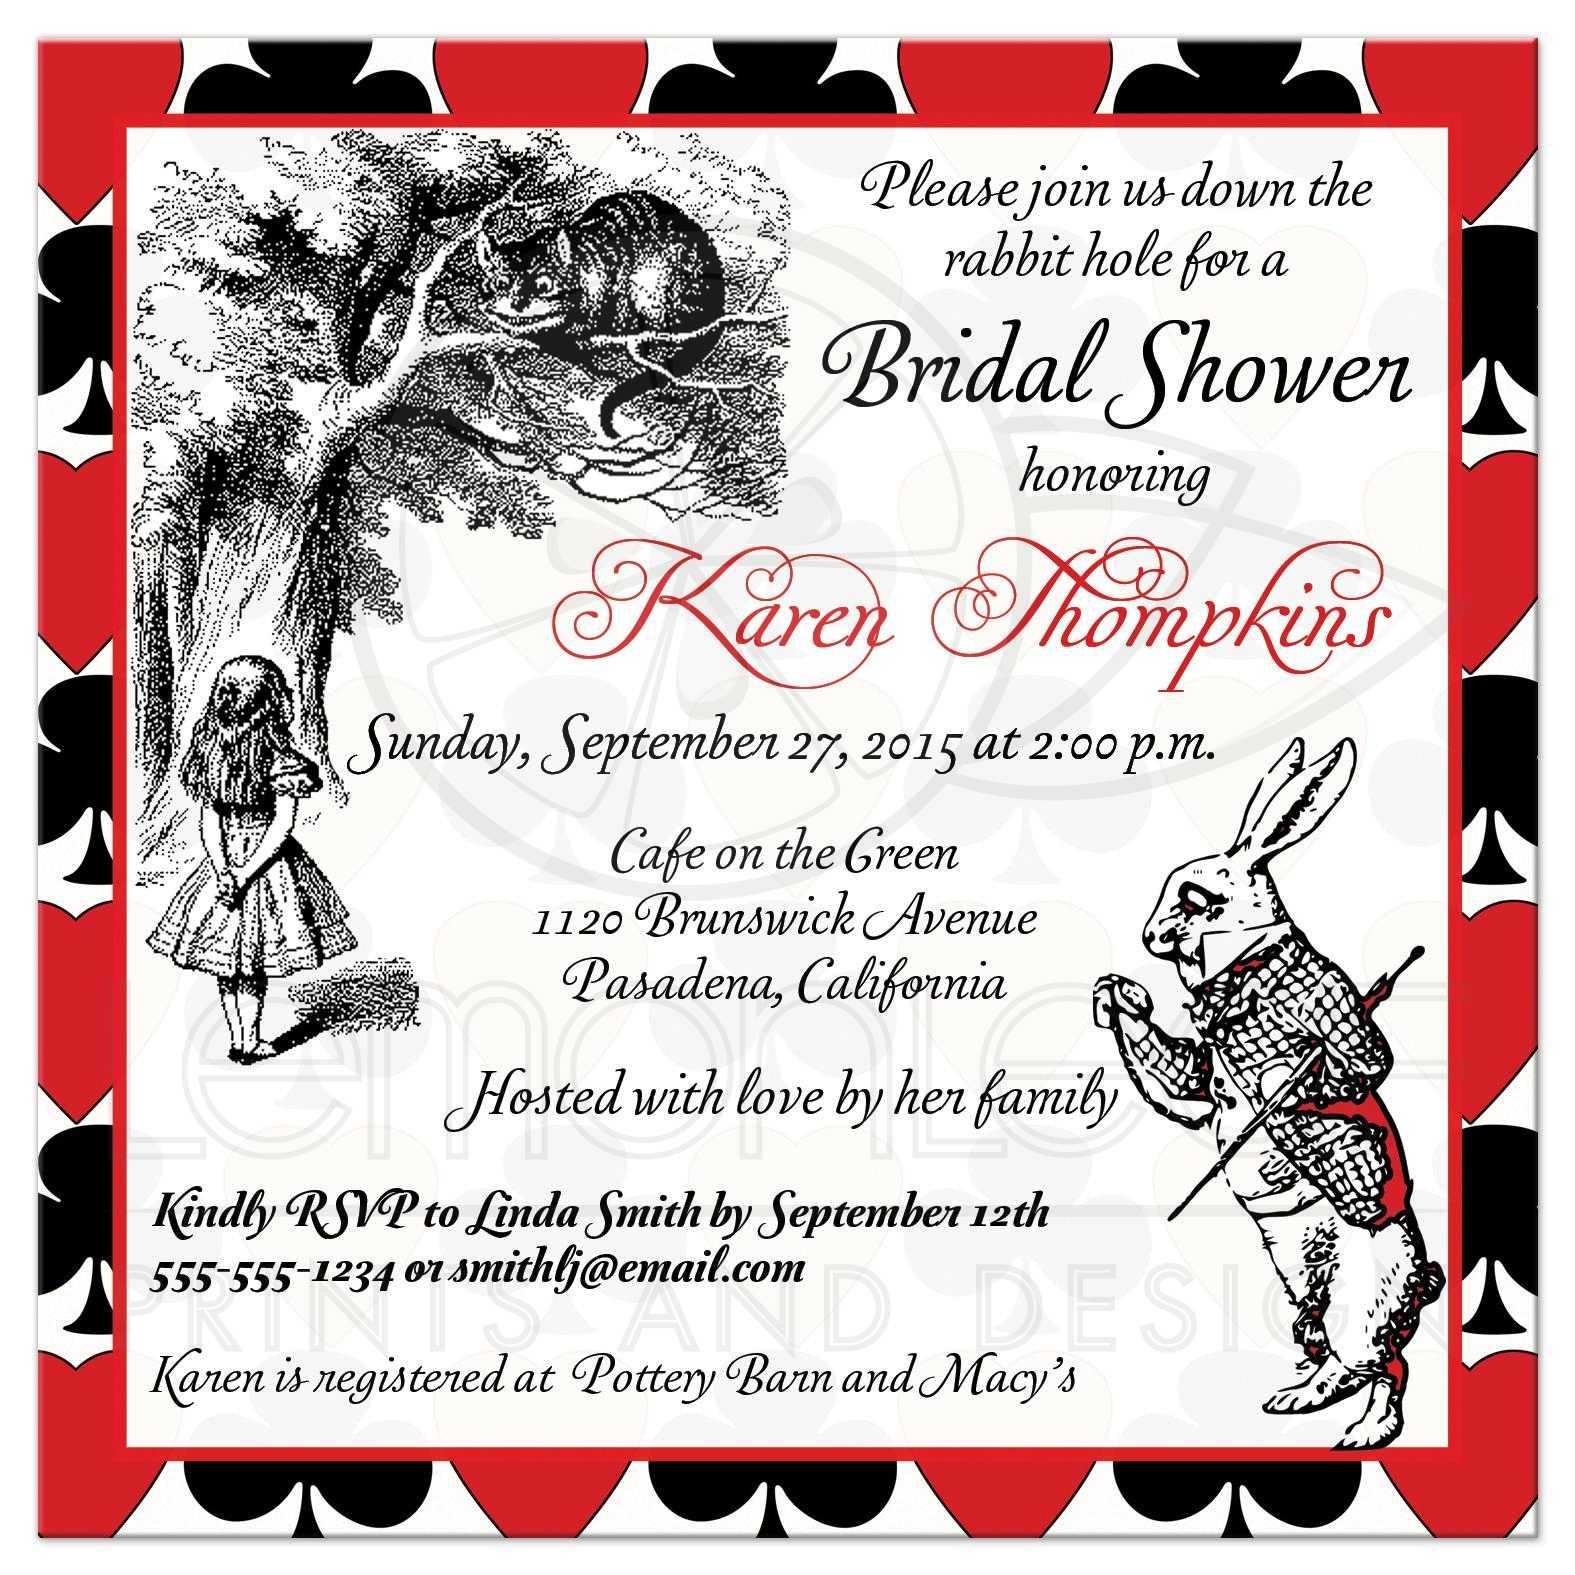 Bridal Shower Invite | Mad Hatter - Alice in Wonderland | Tea Party ...